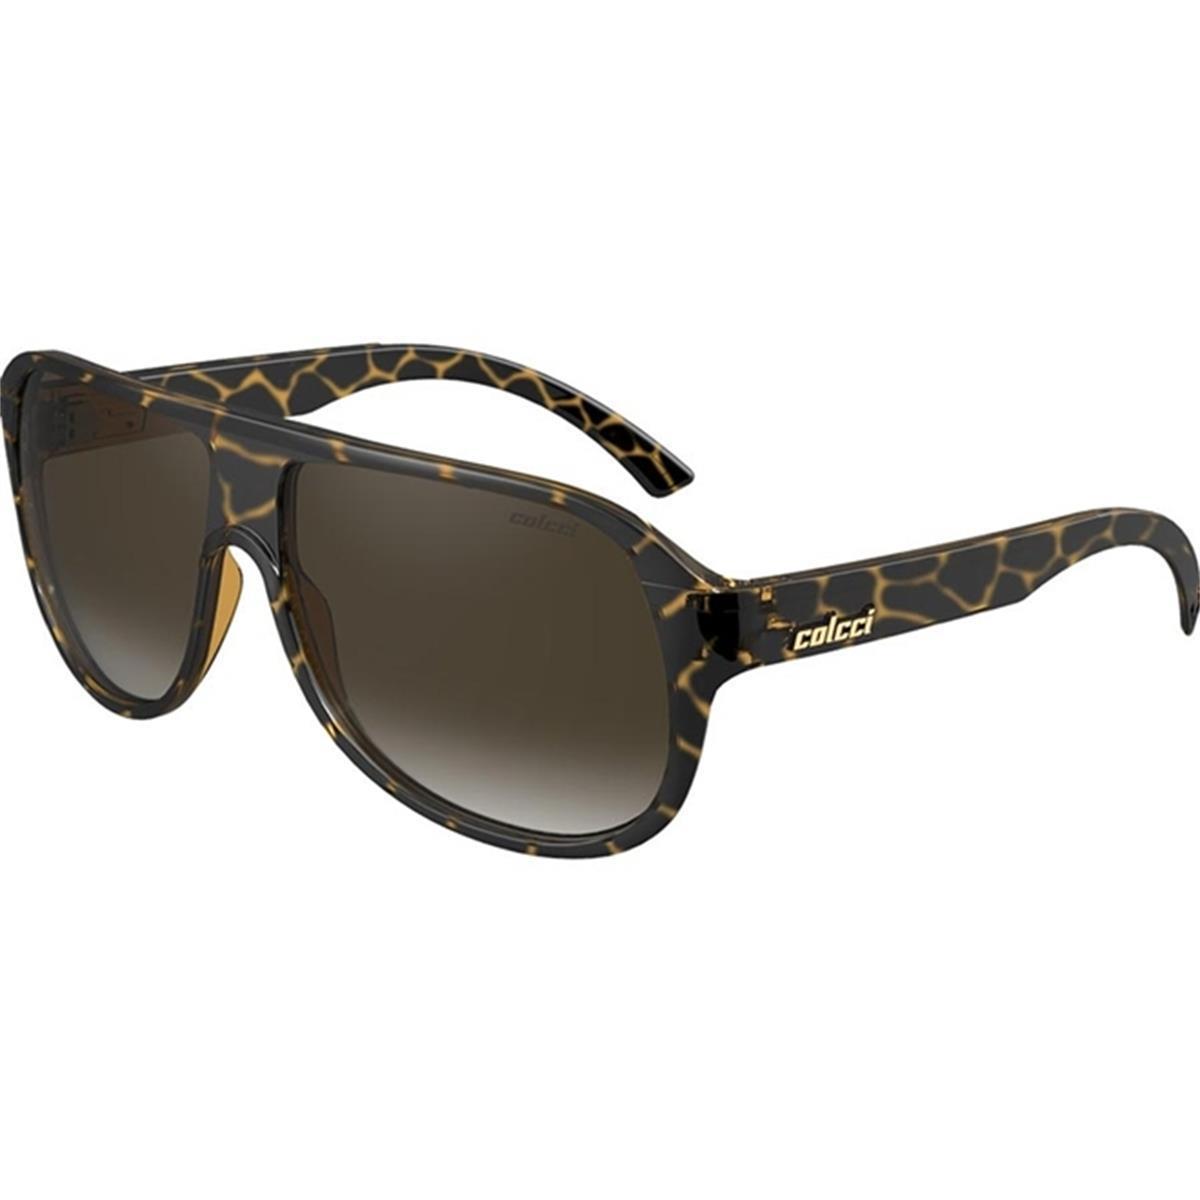 03b33a44a Óculos de Sol Morion Lente Marron Degraê 5013 Colcci